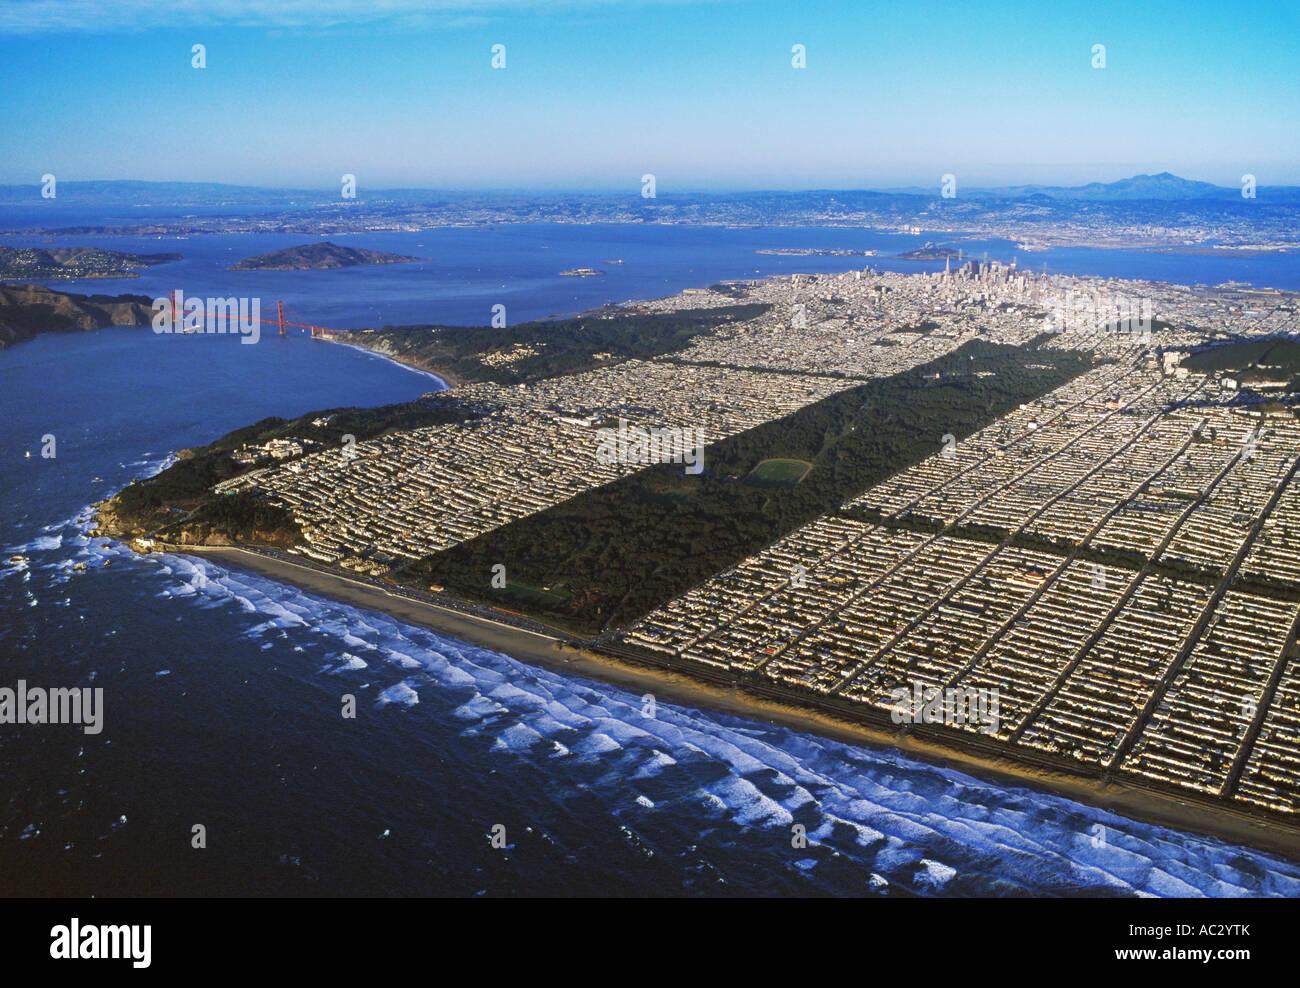 aerial overview above San Francisco's Ocean Beach, Golden Gate park, the Golden Gate bridge, Lands End, the - Stock Image